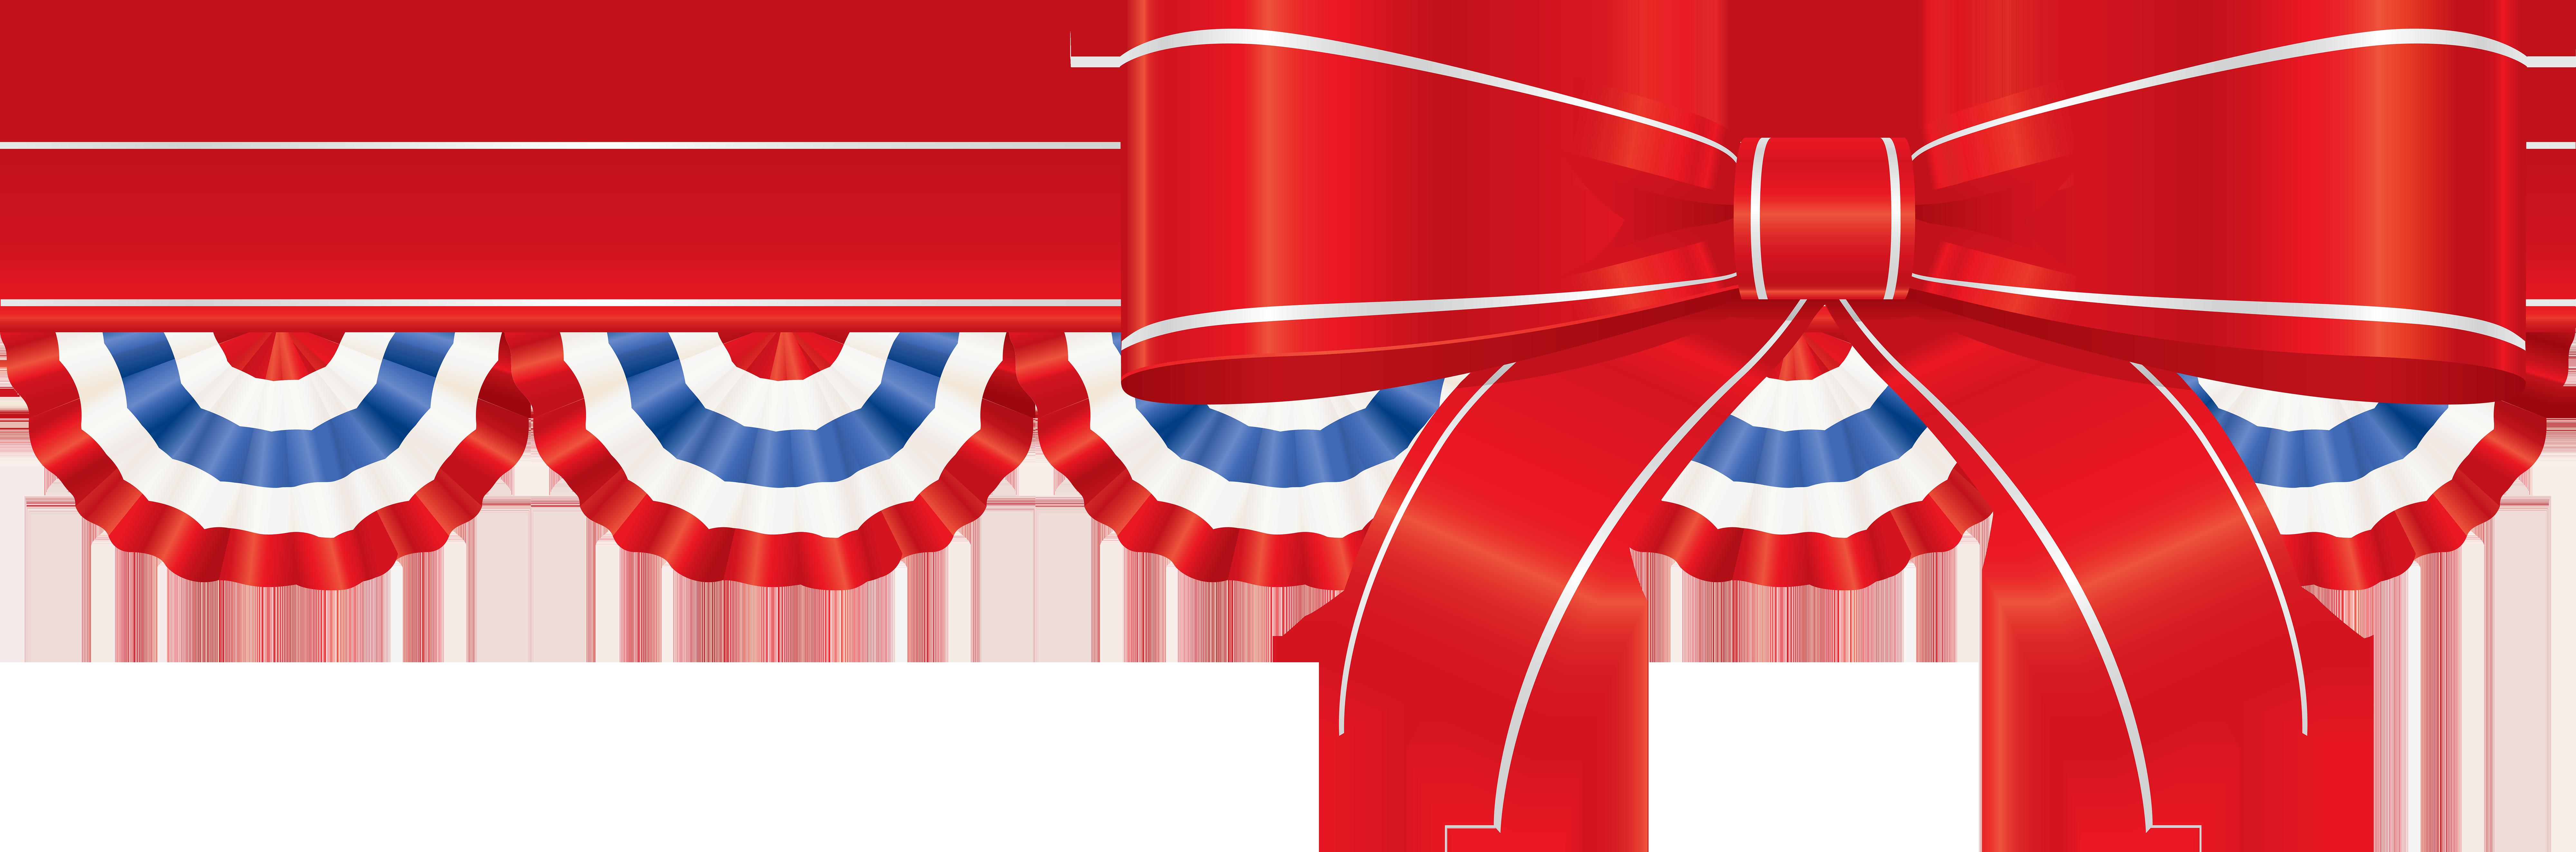 America Ribbon Decor PNG Clip Art Image.